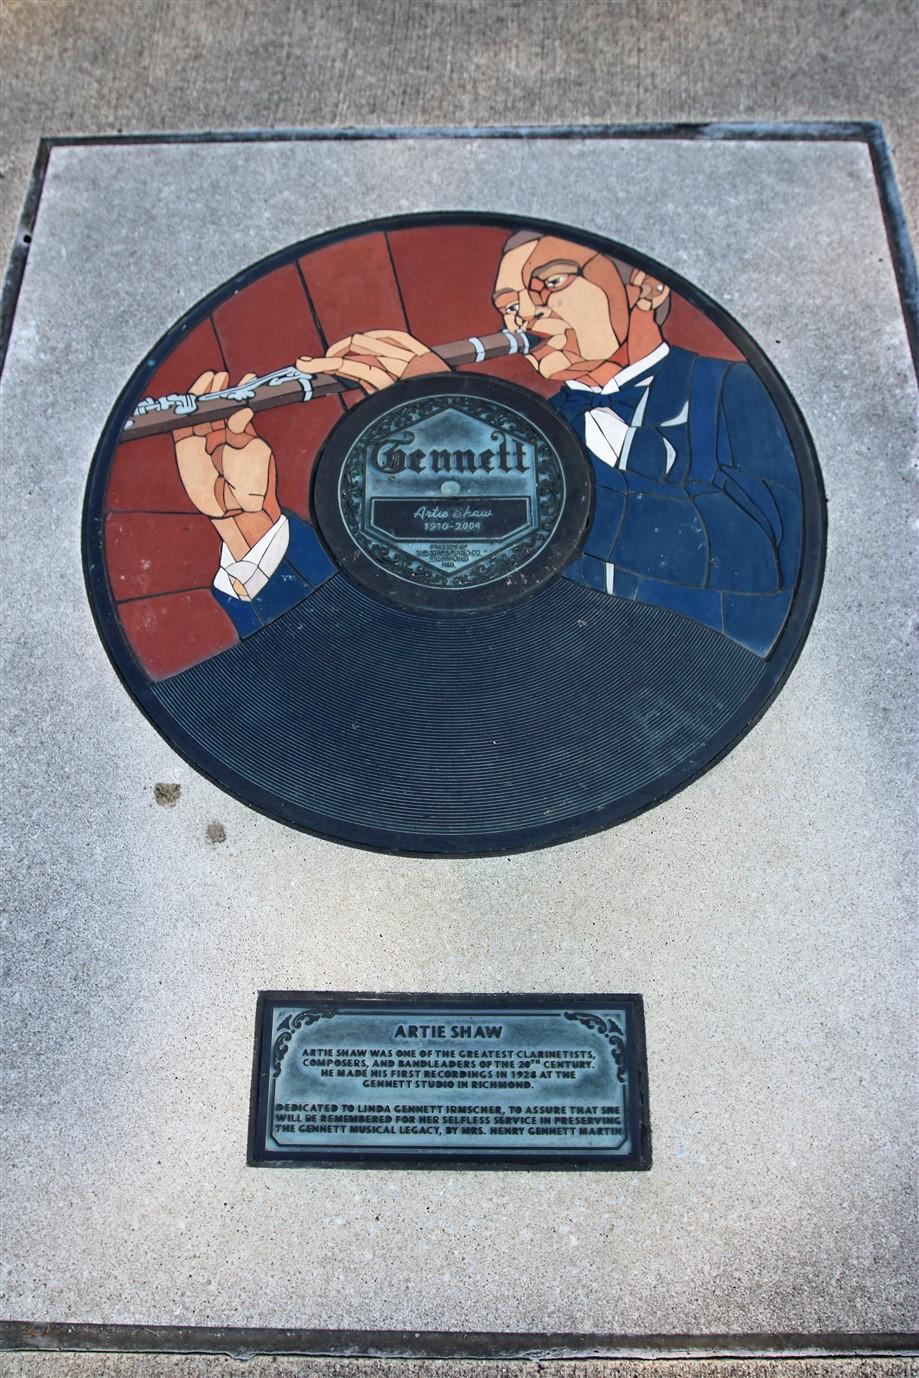 2018 07 17 441  Richmond IN Gennett Records Walk of Fame.jpg